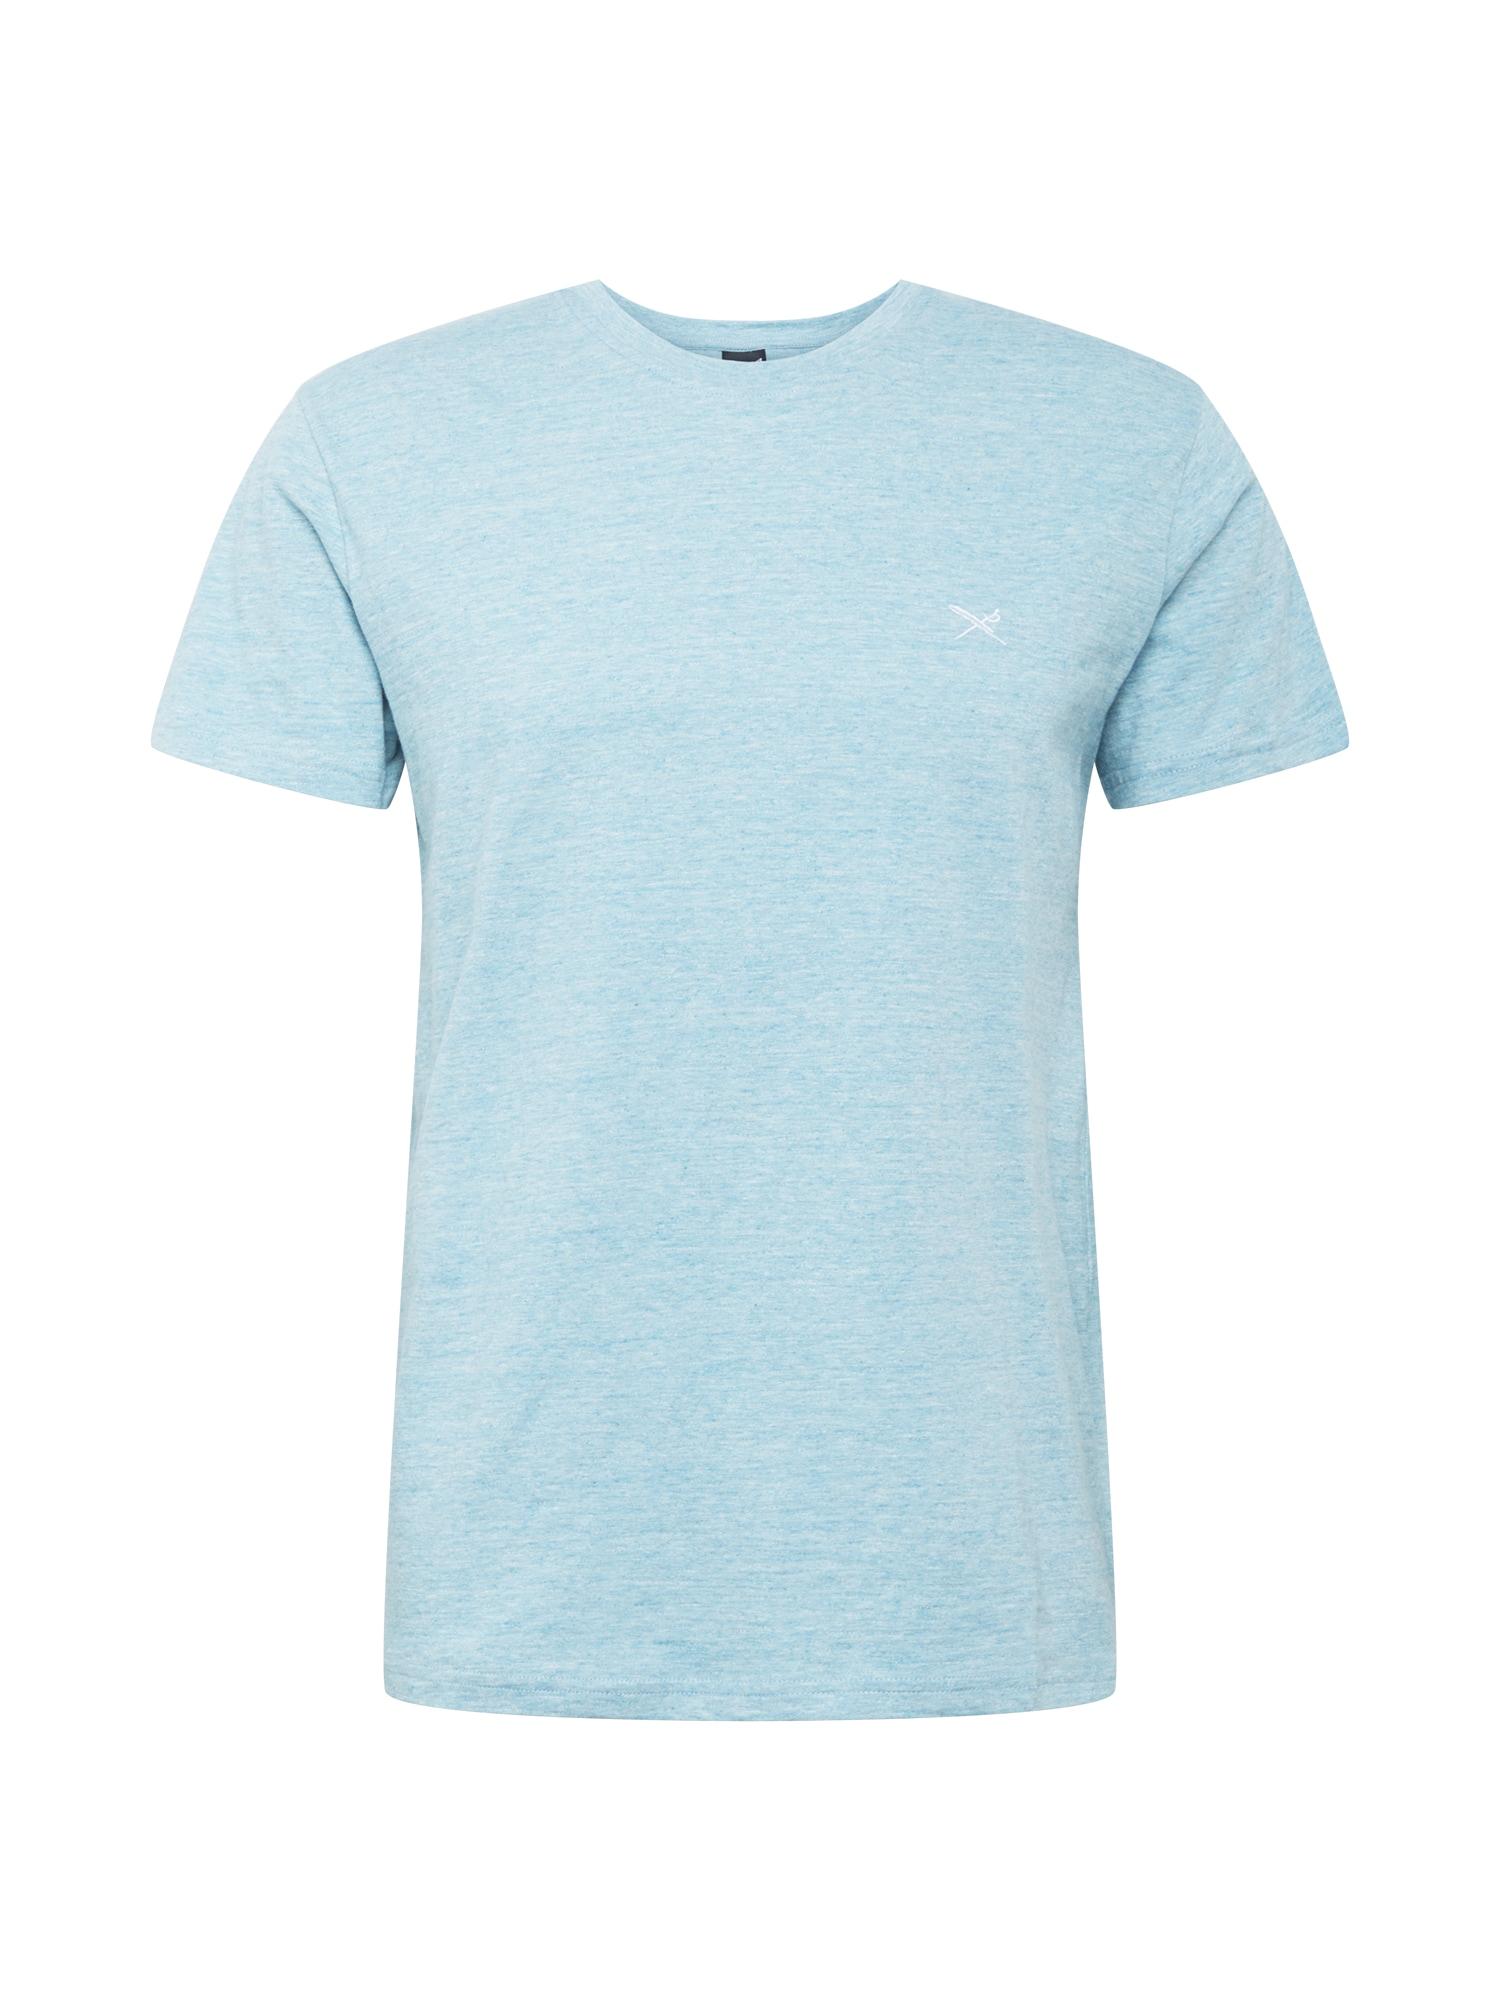 Iriedaily Marškinėliai 'Chamisso' margai mėlyna